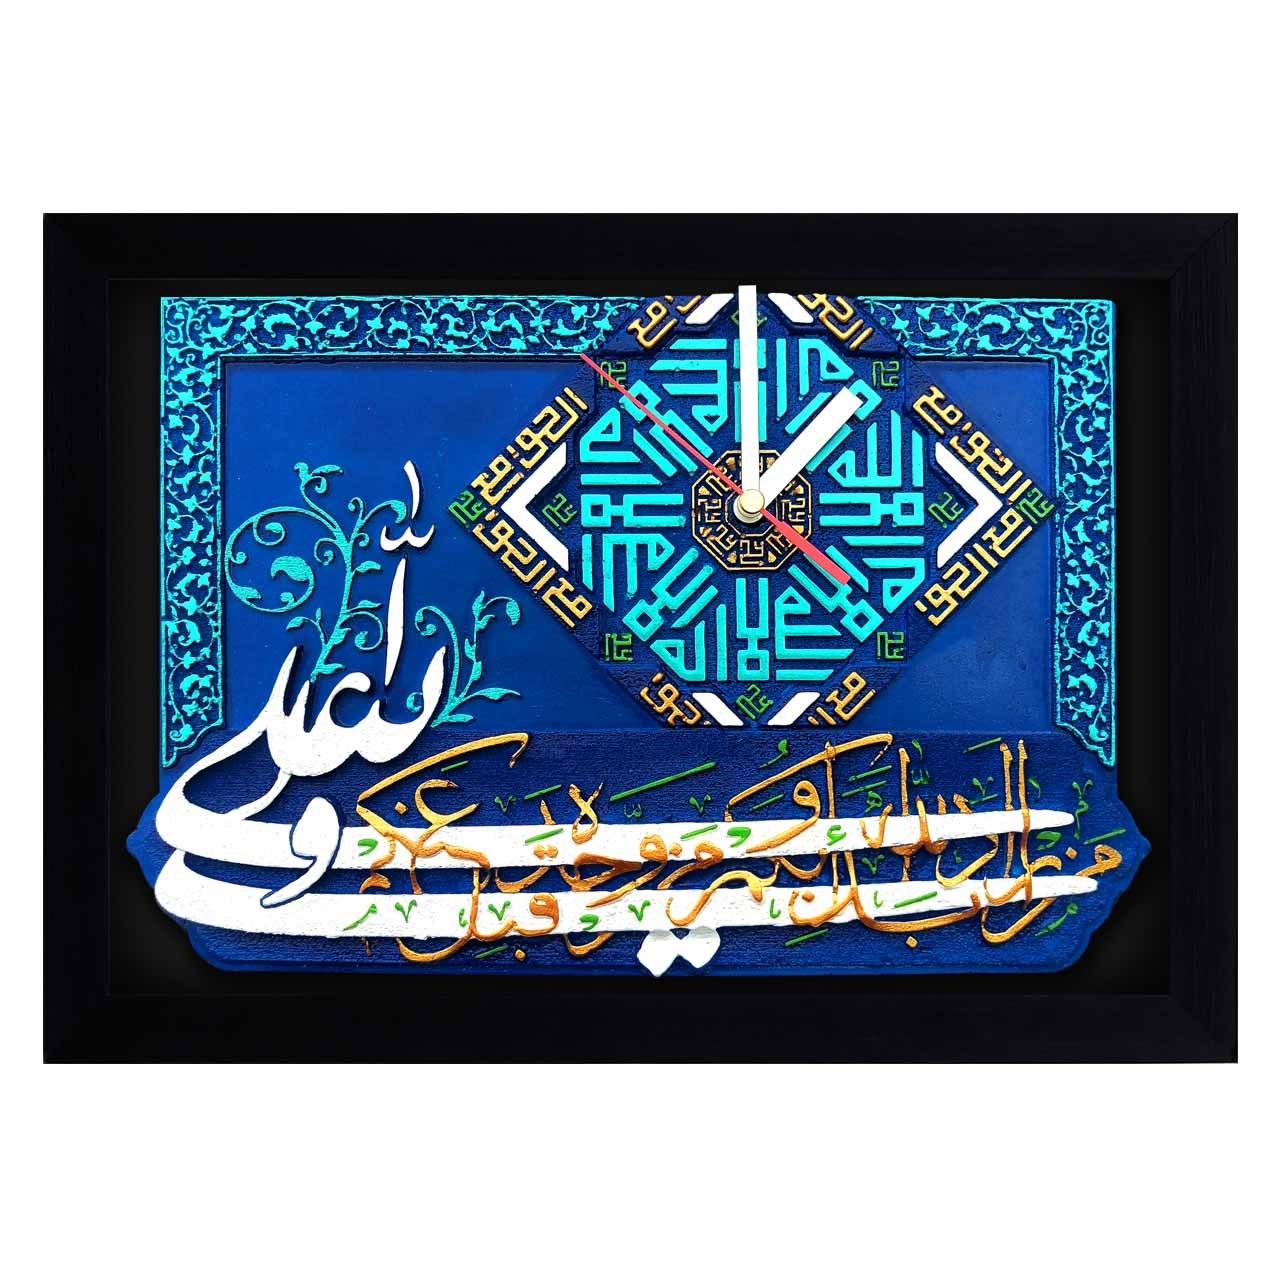 عکس کتیبه نقش برجسته لوح هنر طرح ساعت دیواری علی ولی الله کد 131